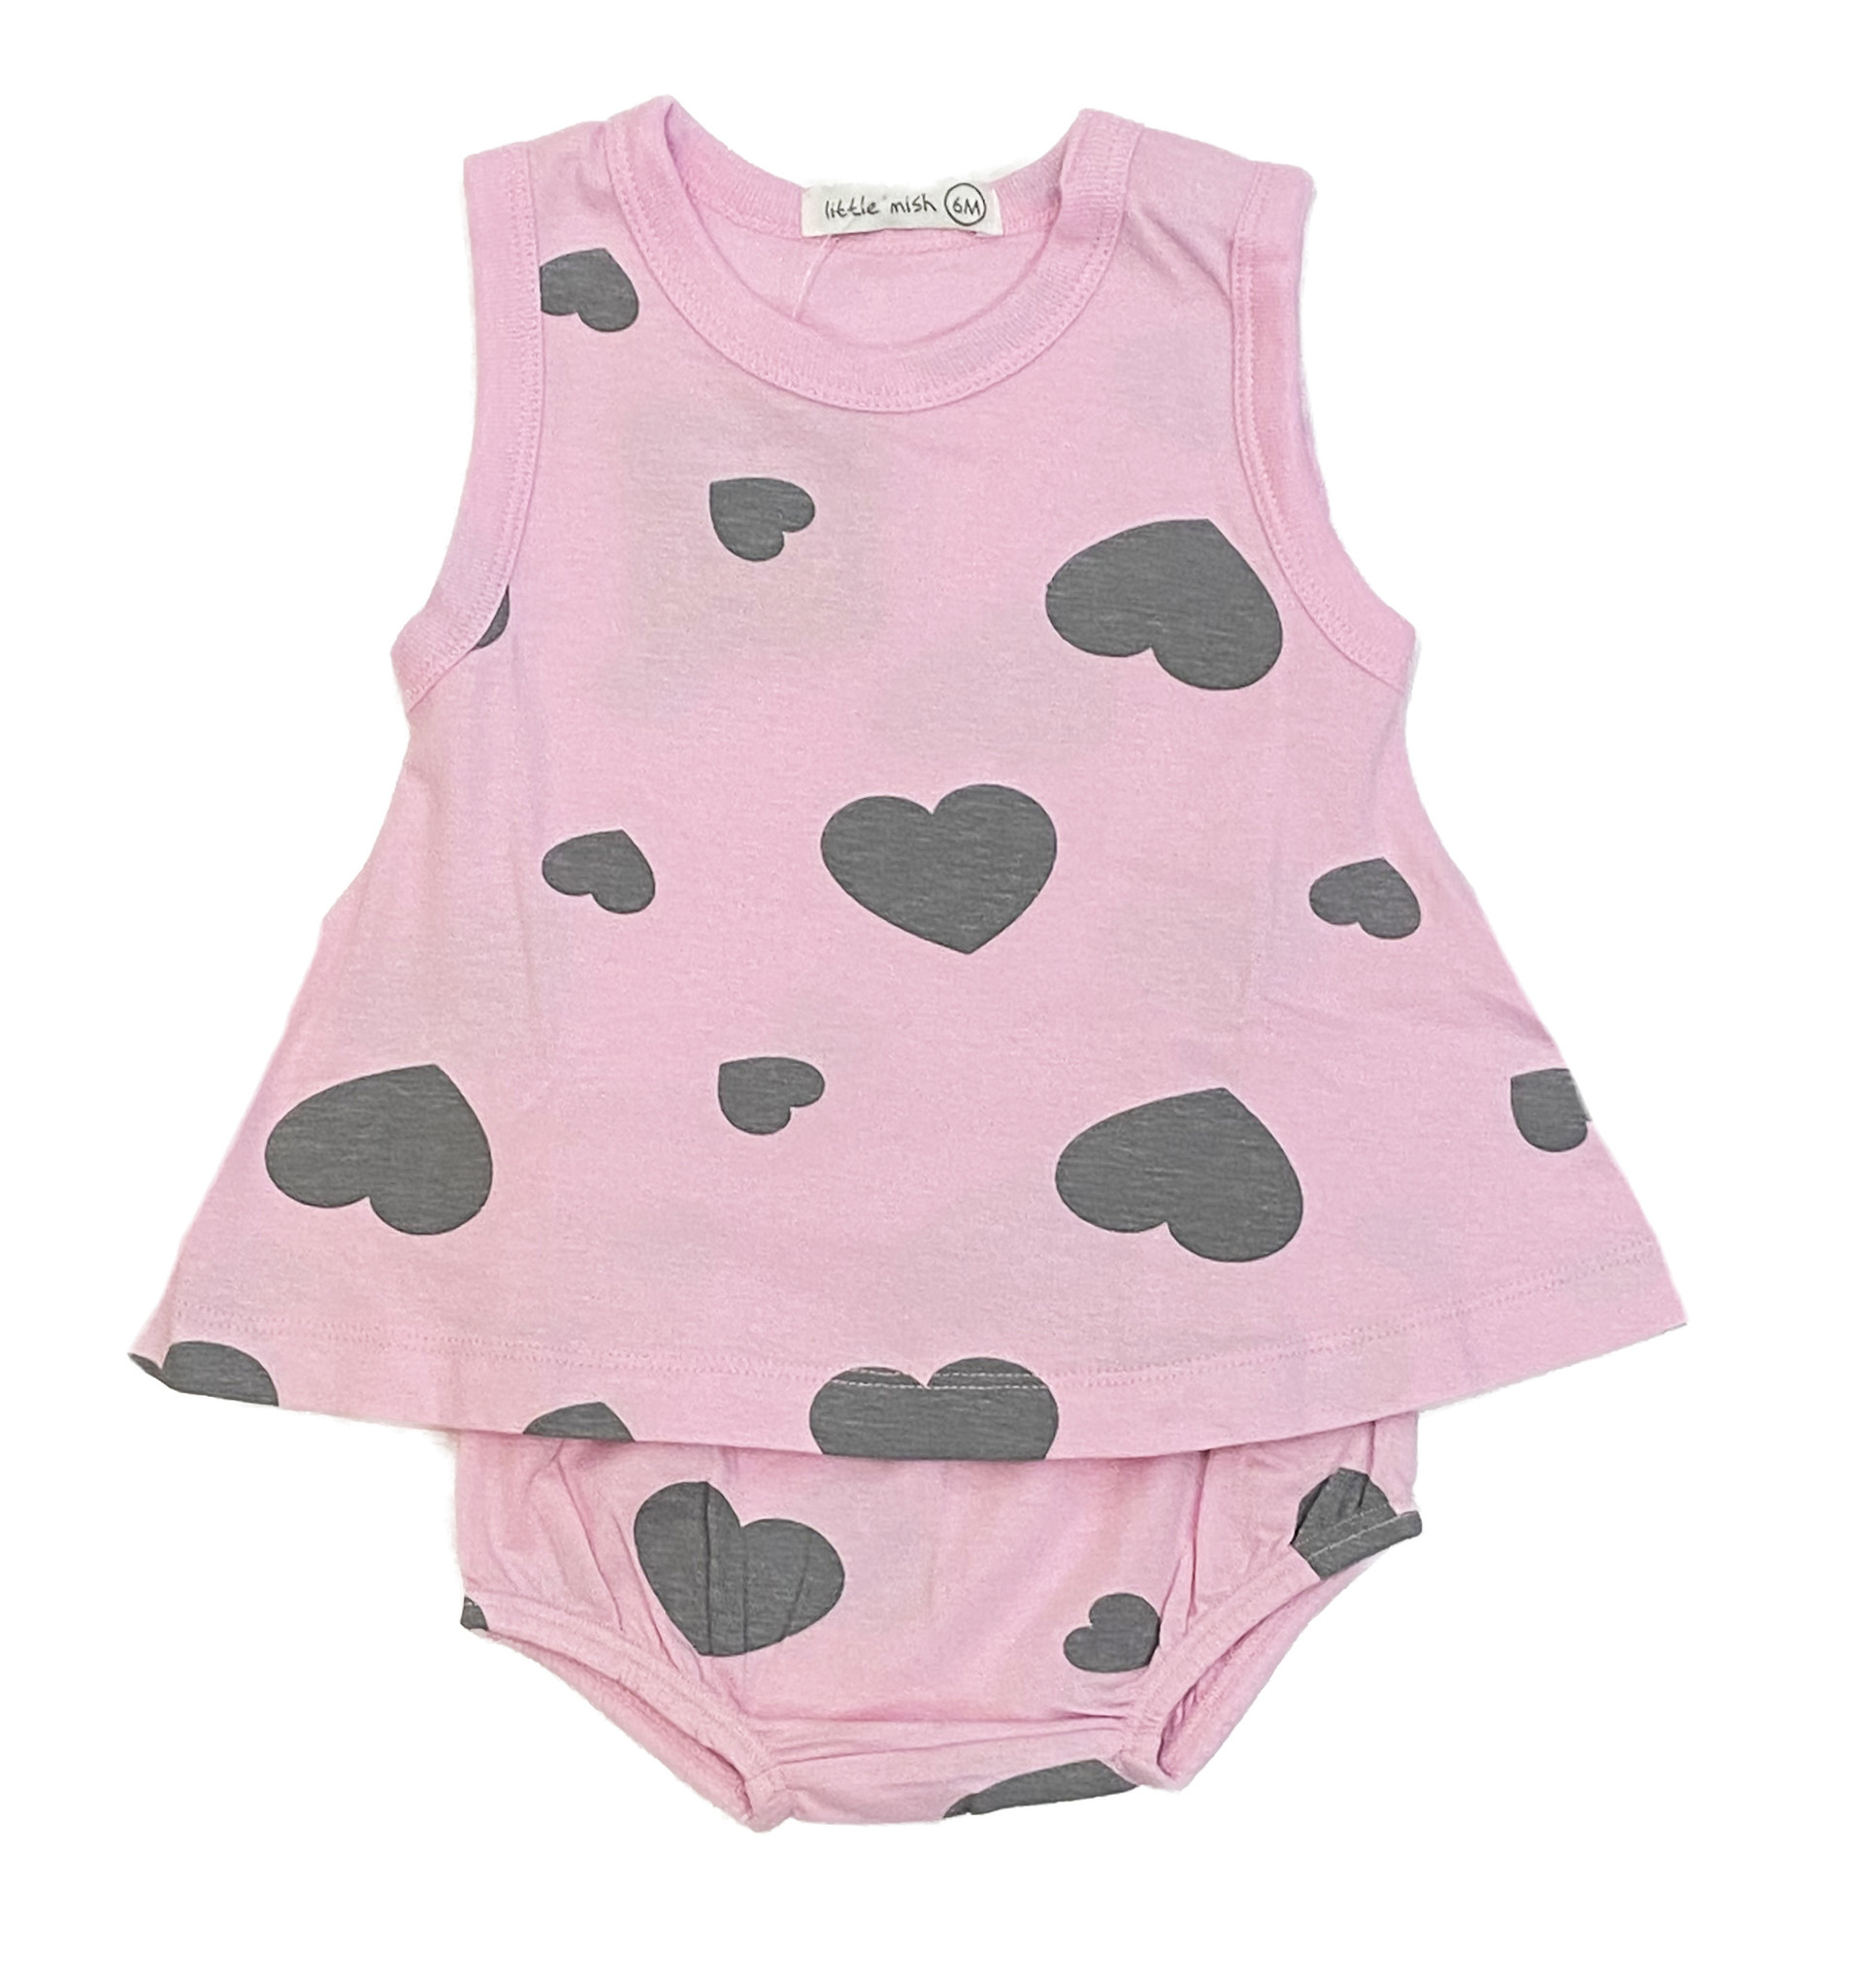 Little Mish Pink/Grey Hearts Swing Set